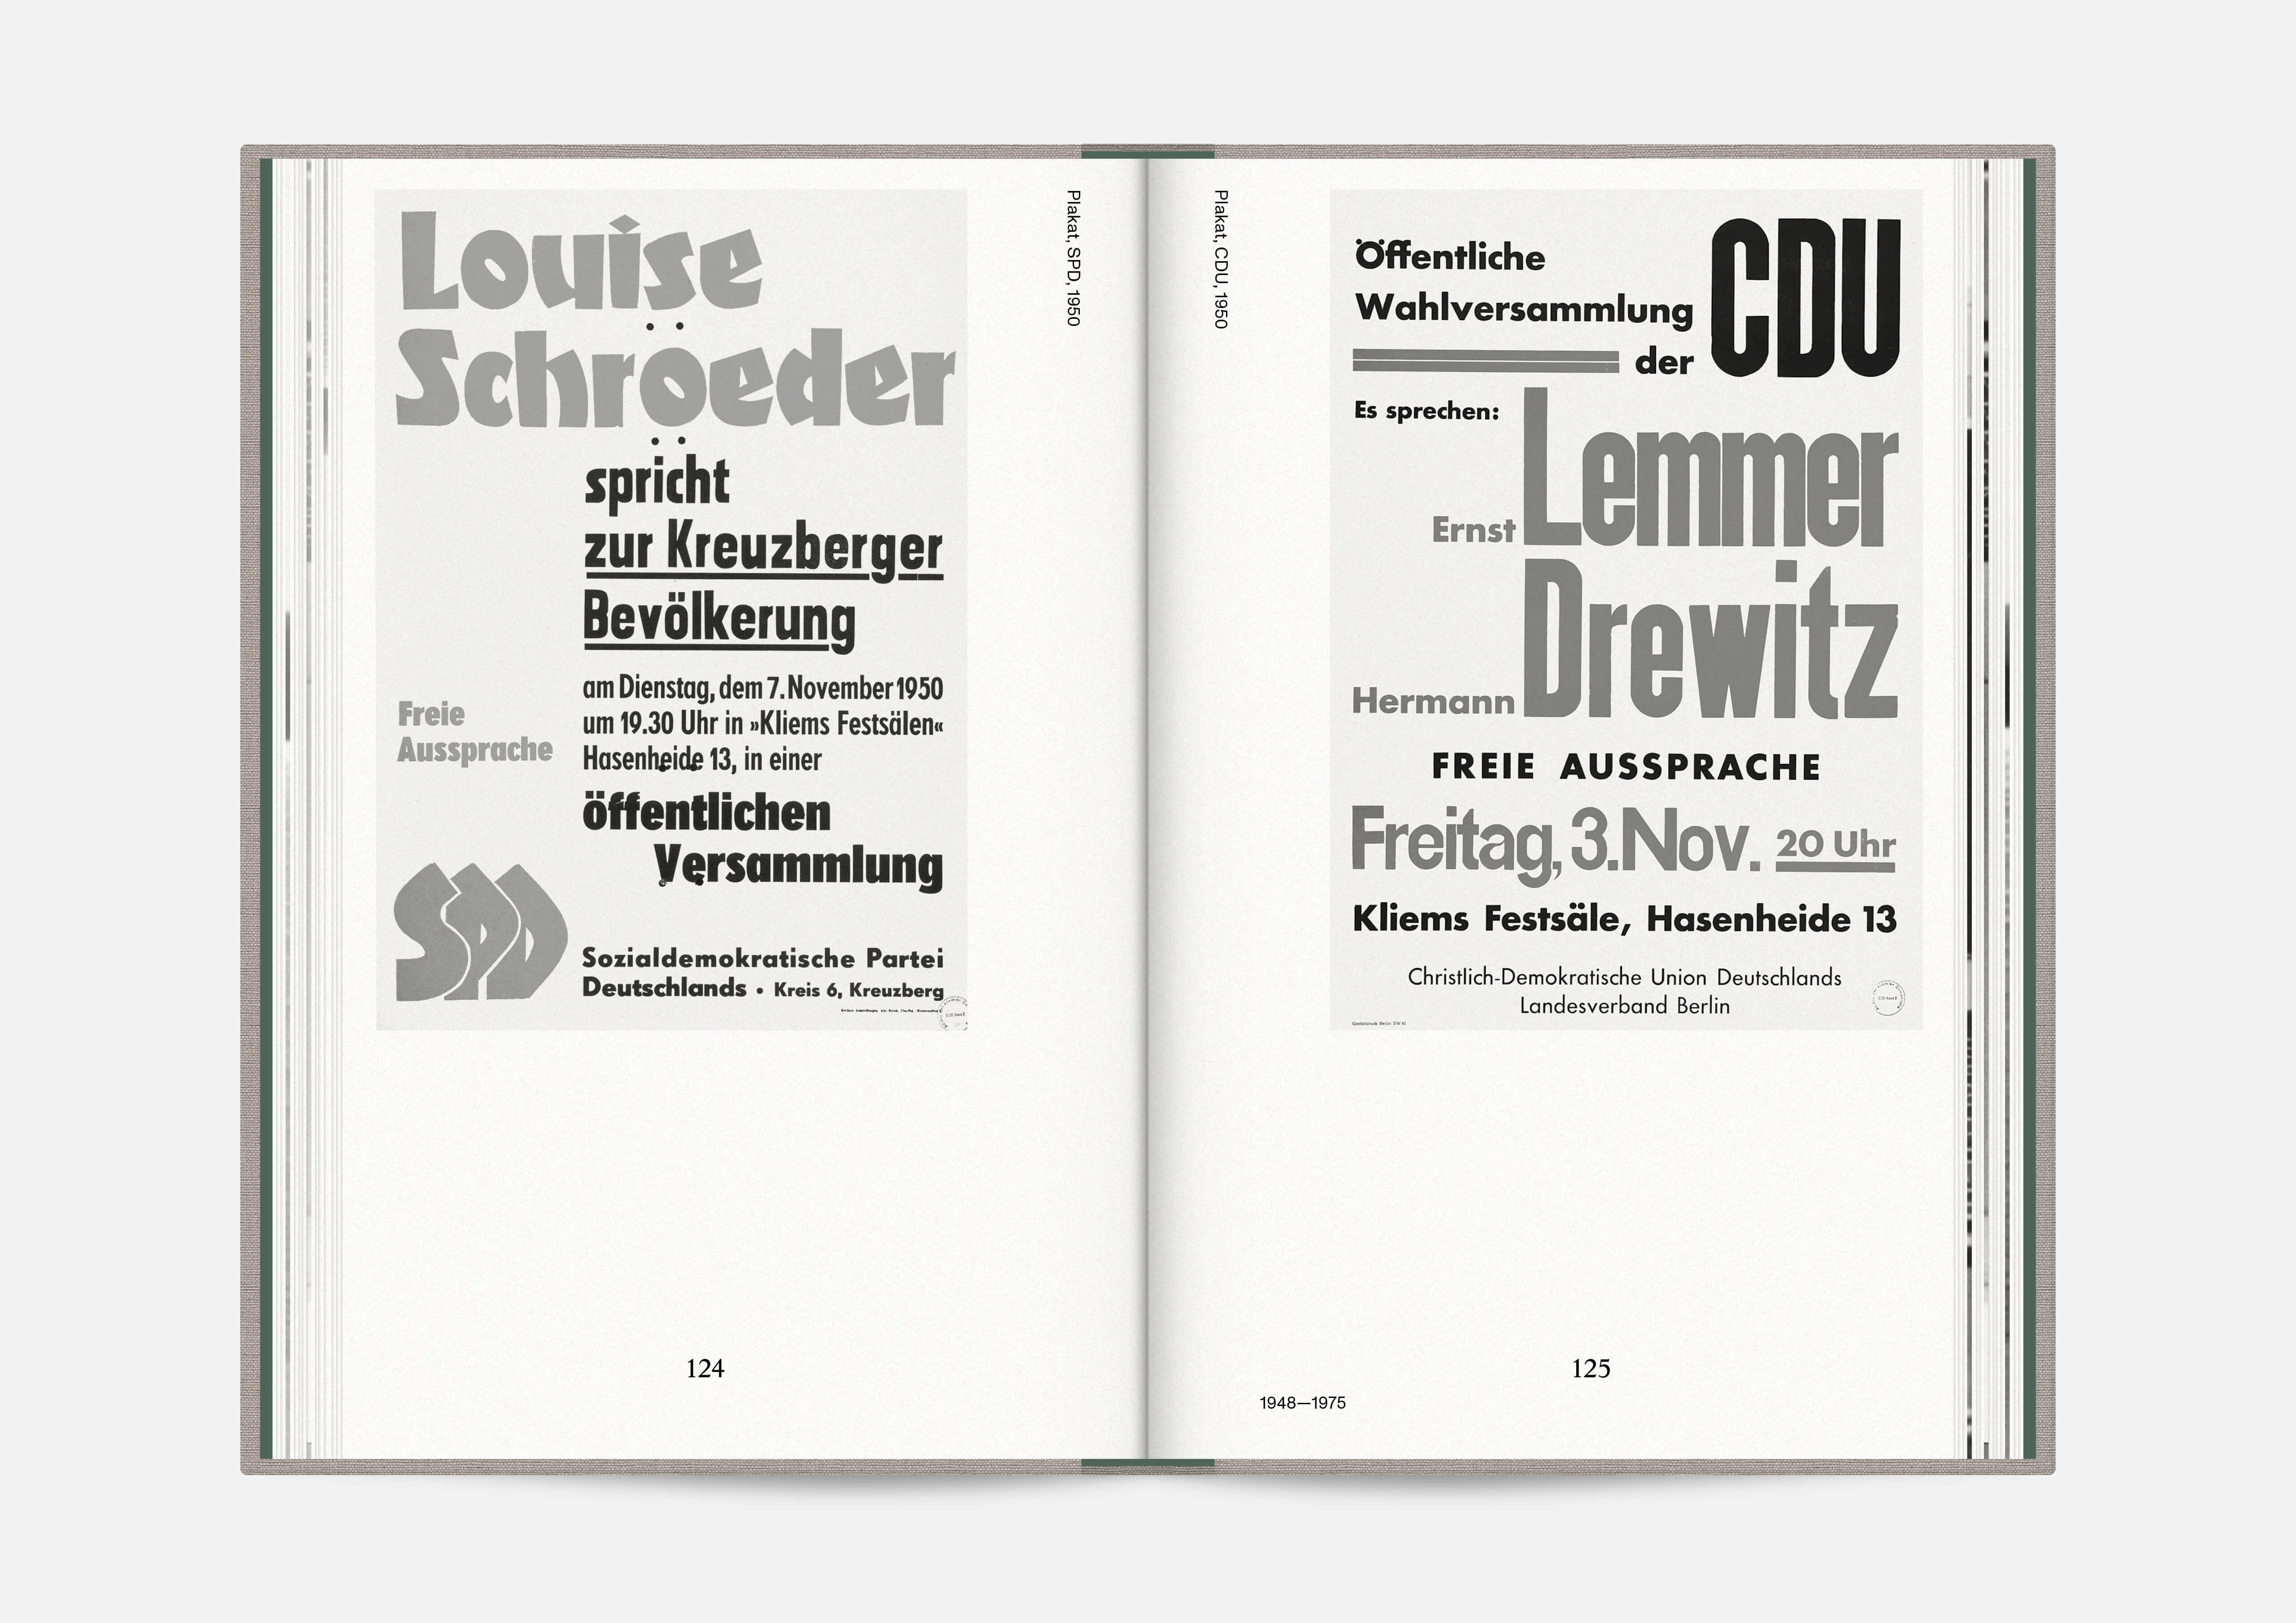 https://neuegestaltung.de/media/pages/clients/sammlung-wemhoner-hasenheide-13/5e5b5f7bfb-1628761382/sw-hasenheide_22.jpg